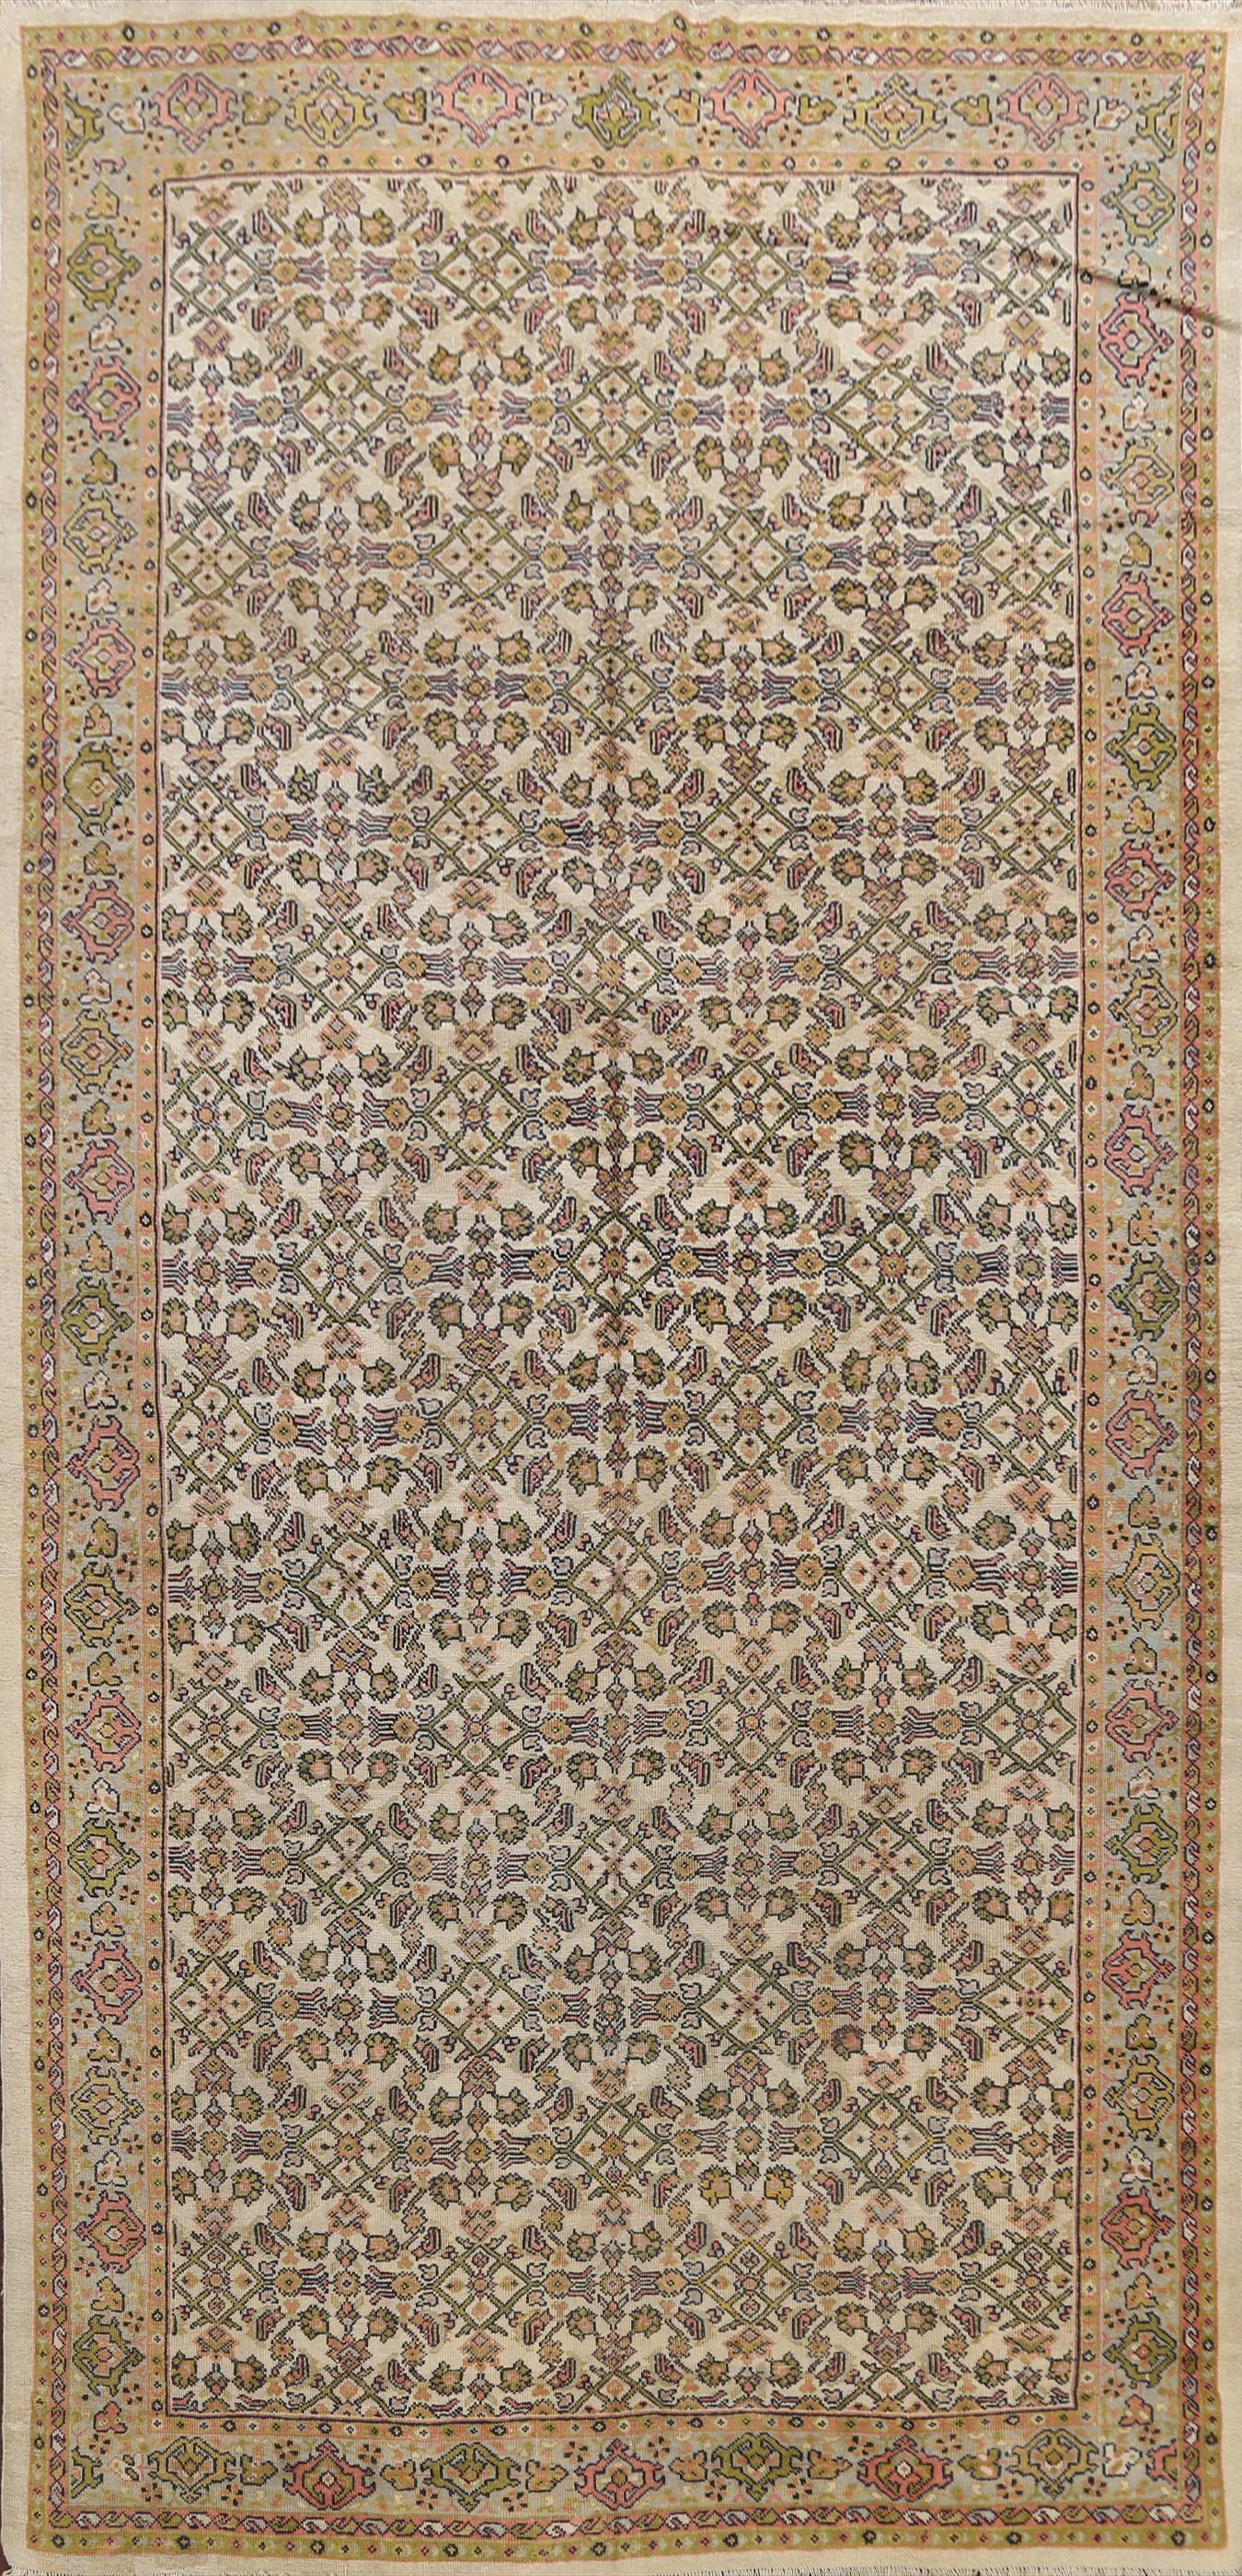 Antique Vegetable Dye Mahal Persian Area Rug 7x12